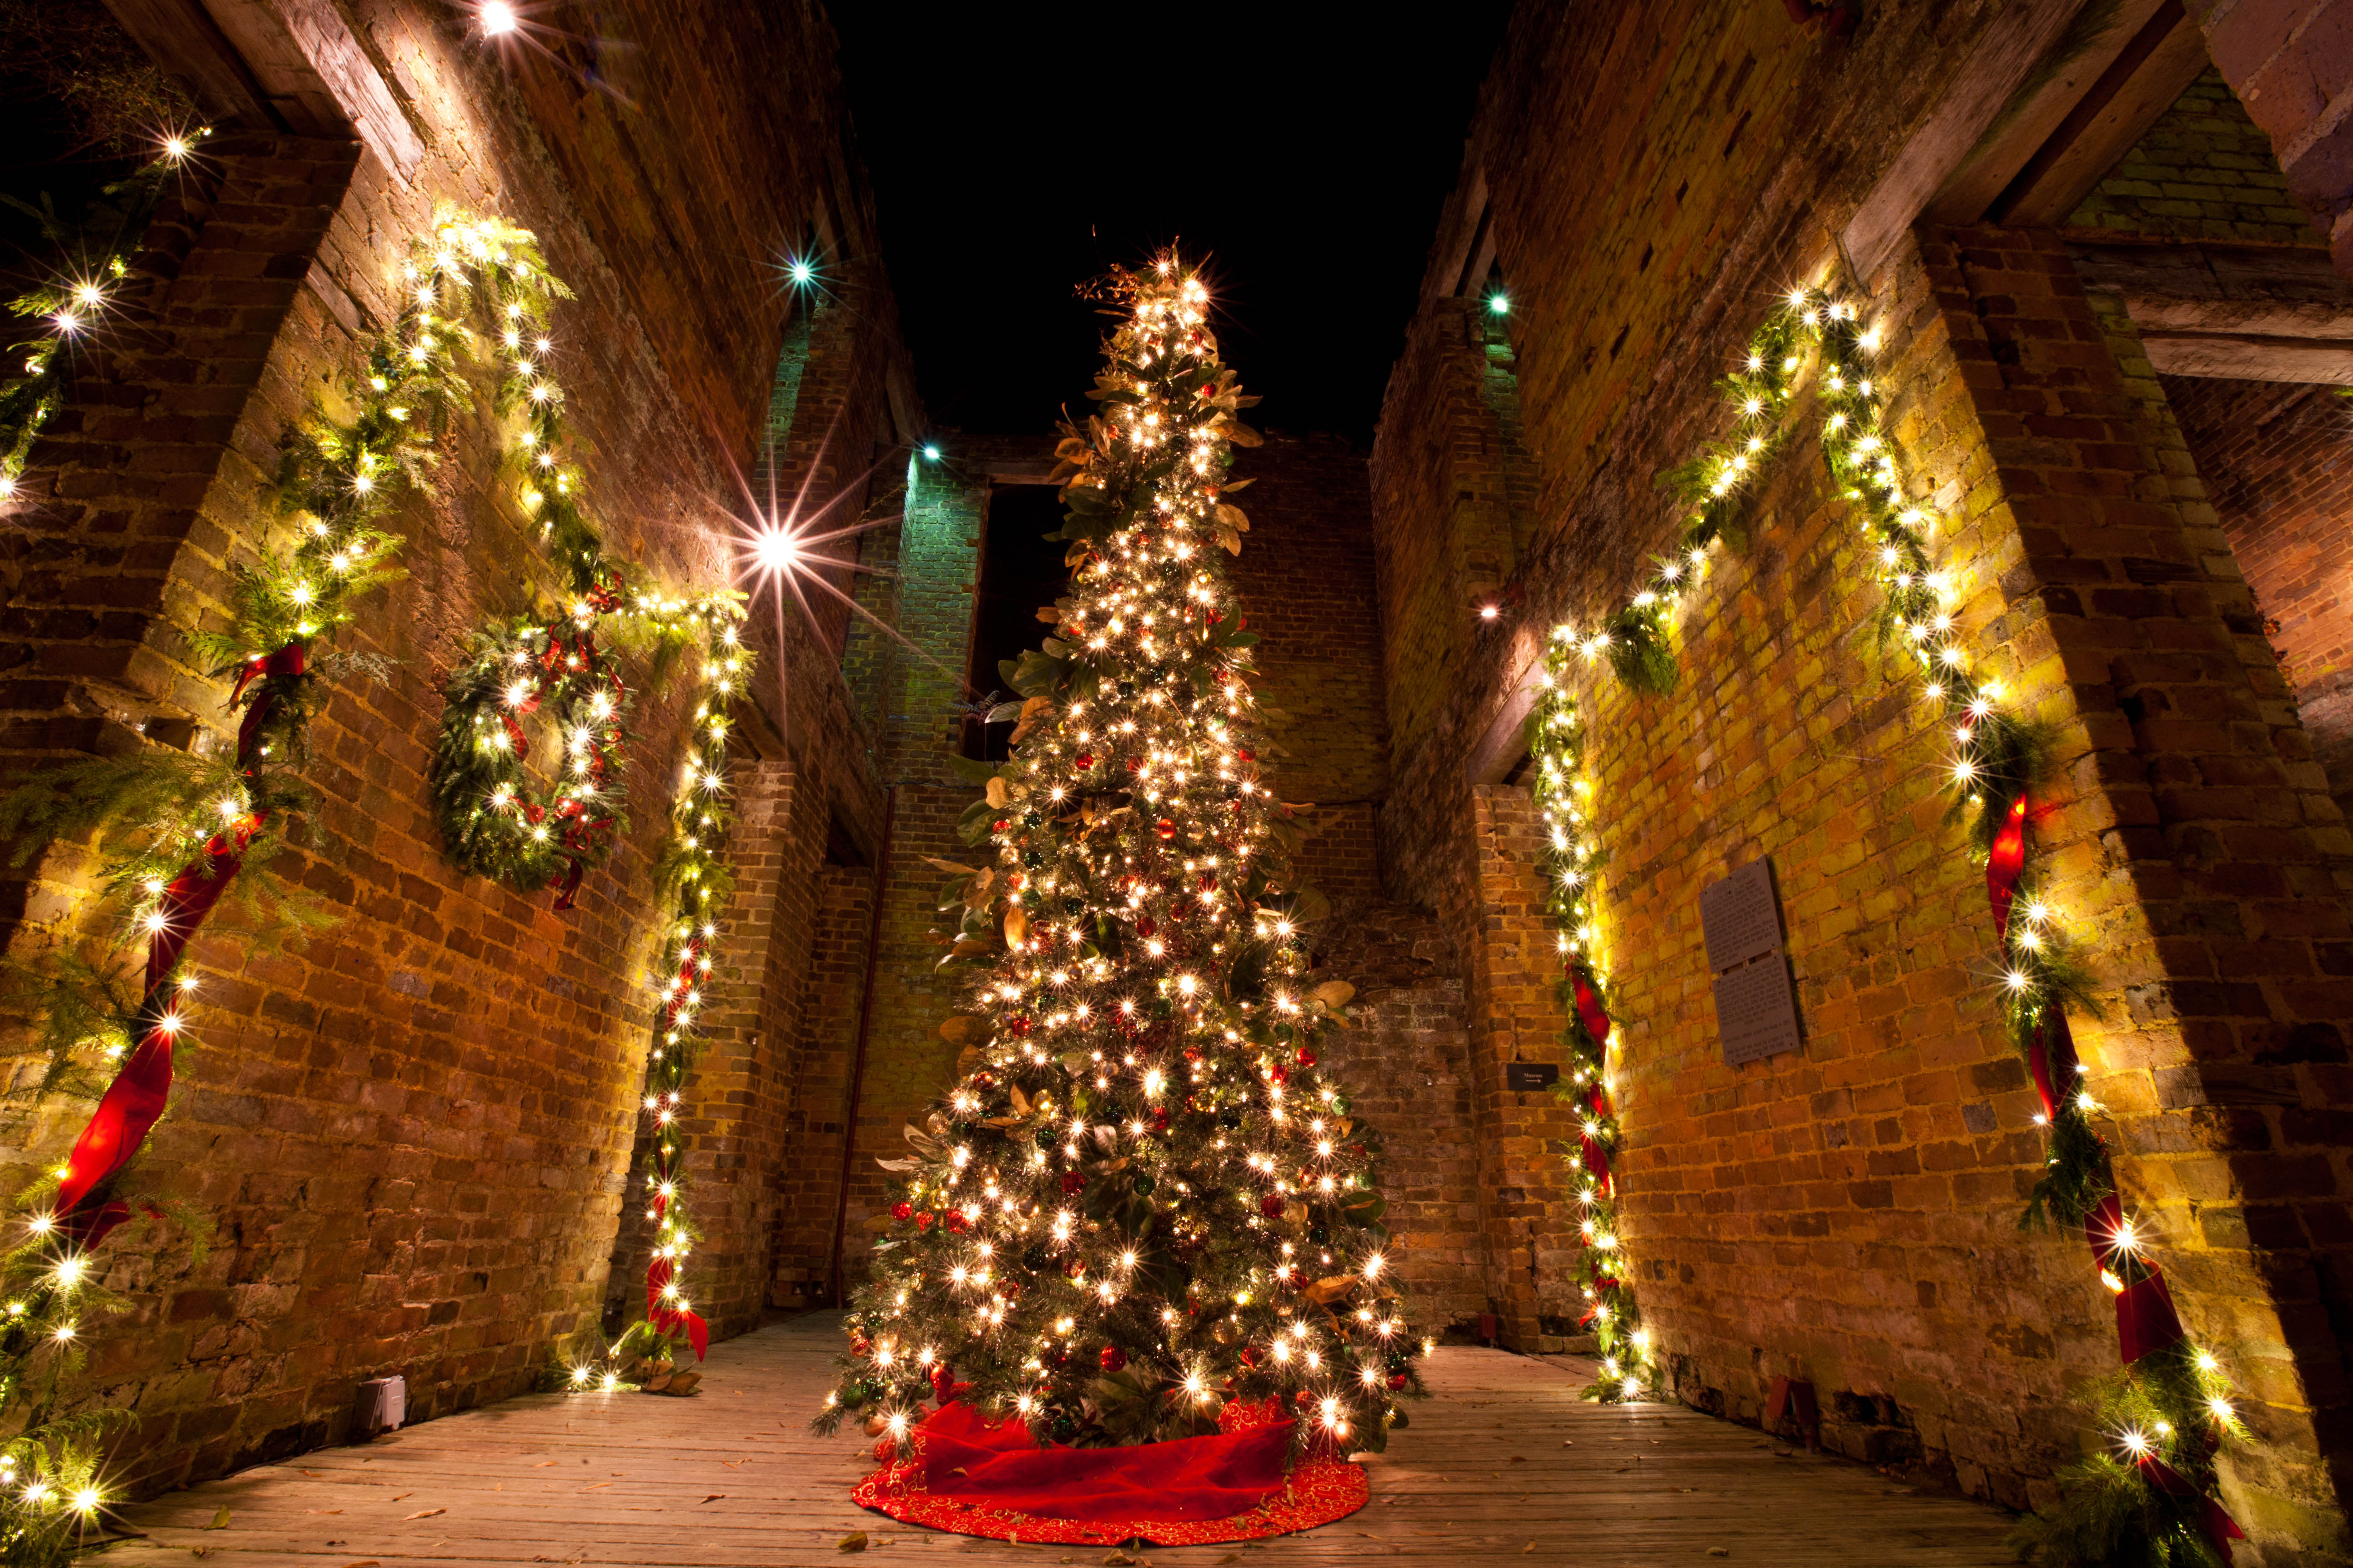 light up the holidays at barnsley resort for a festive december getaway